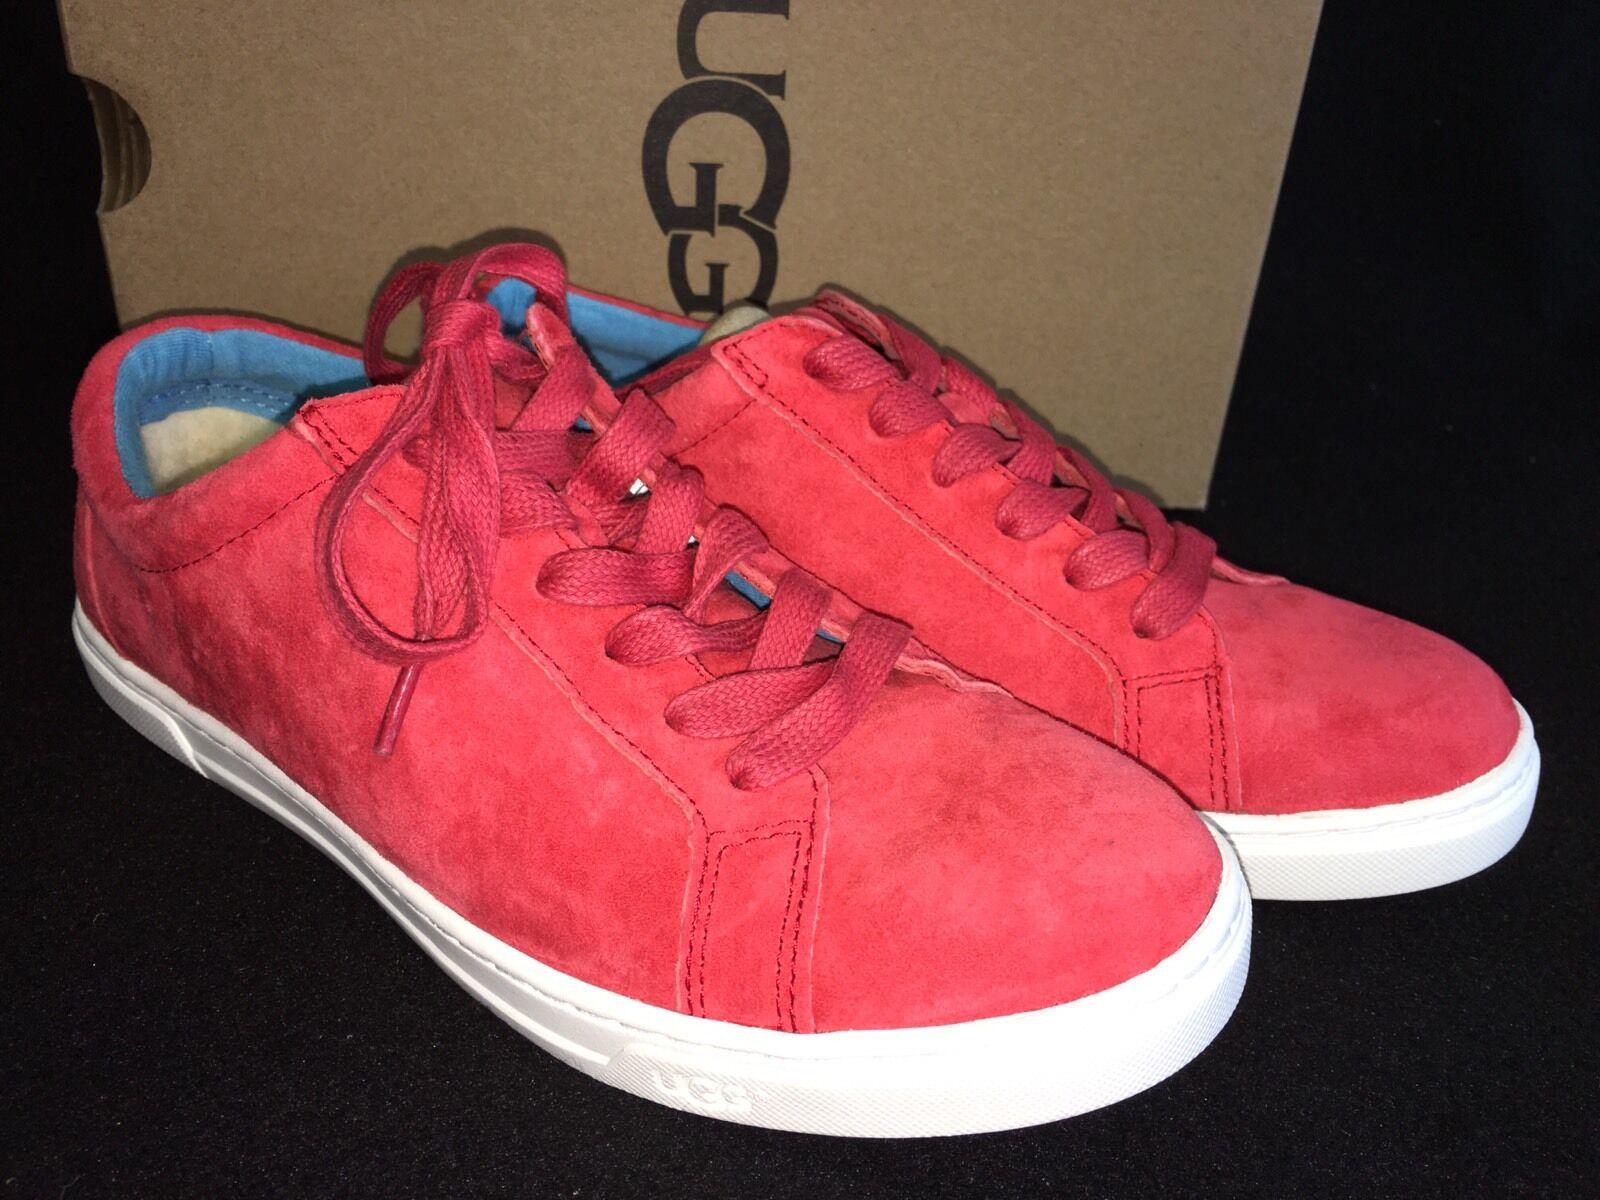 Ugg Australia Karine Womens Fashion Sneaker Tango Red Suede Lace Up Shoe 1015044